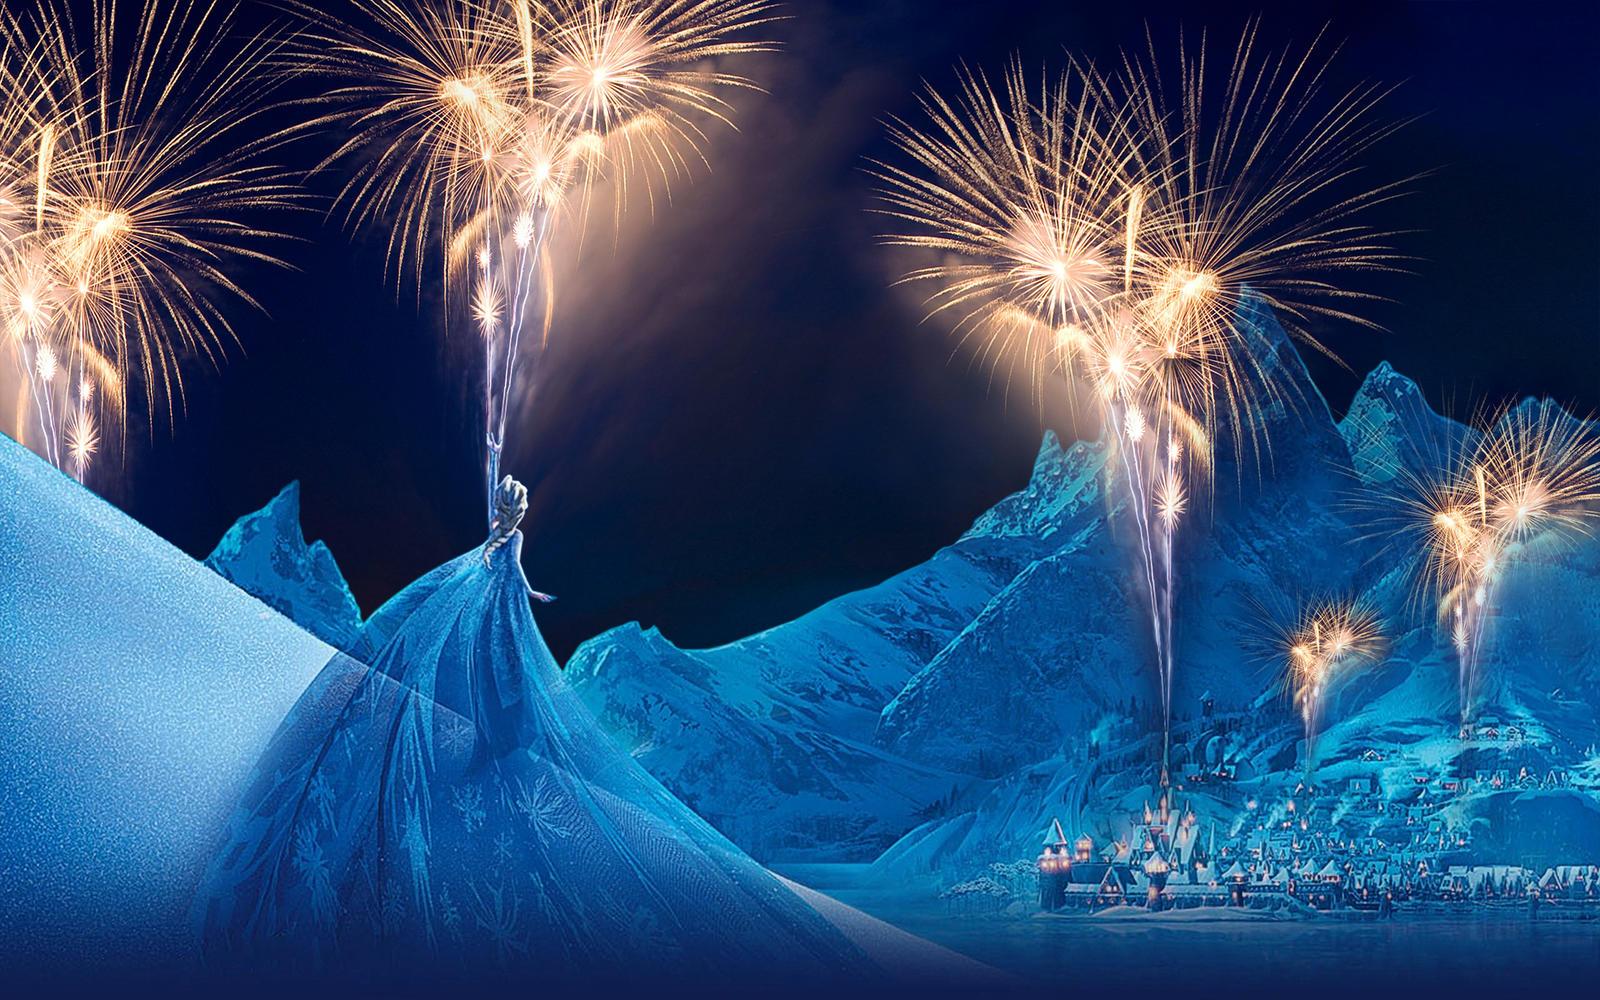 1600 x 1000 jpeg 501kB, Frozen - 1920x1200 (Happy New Year - Simple ...